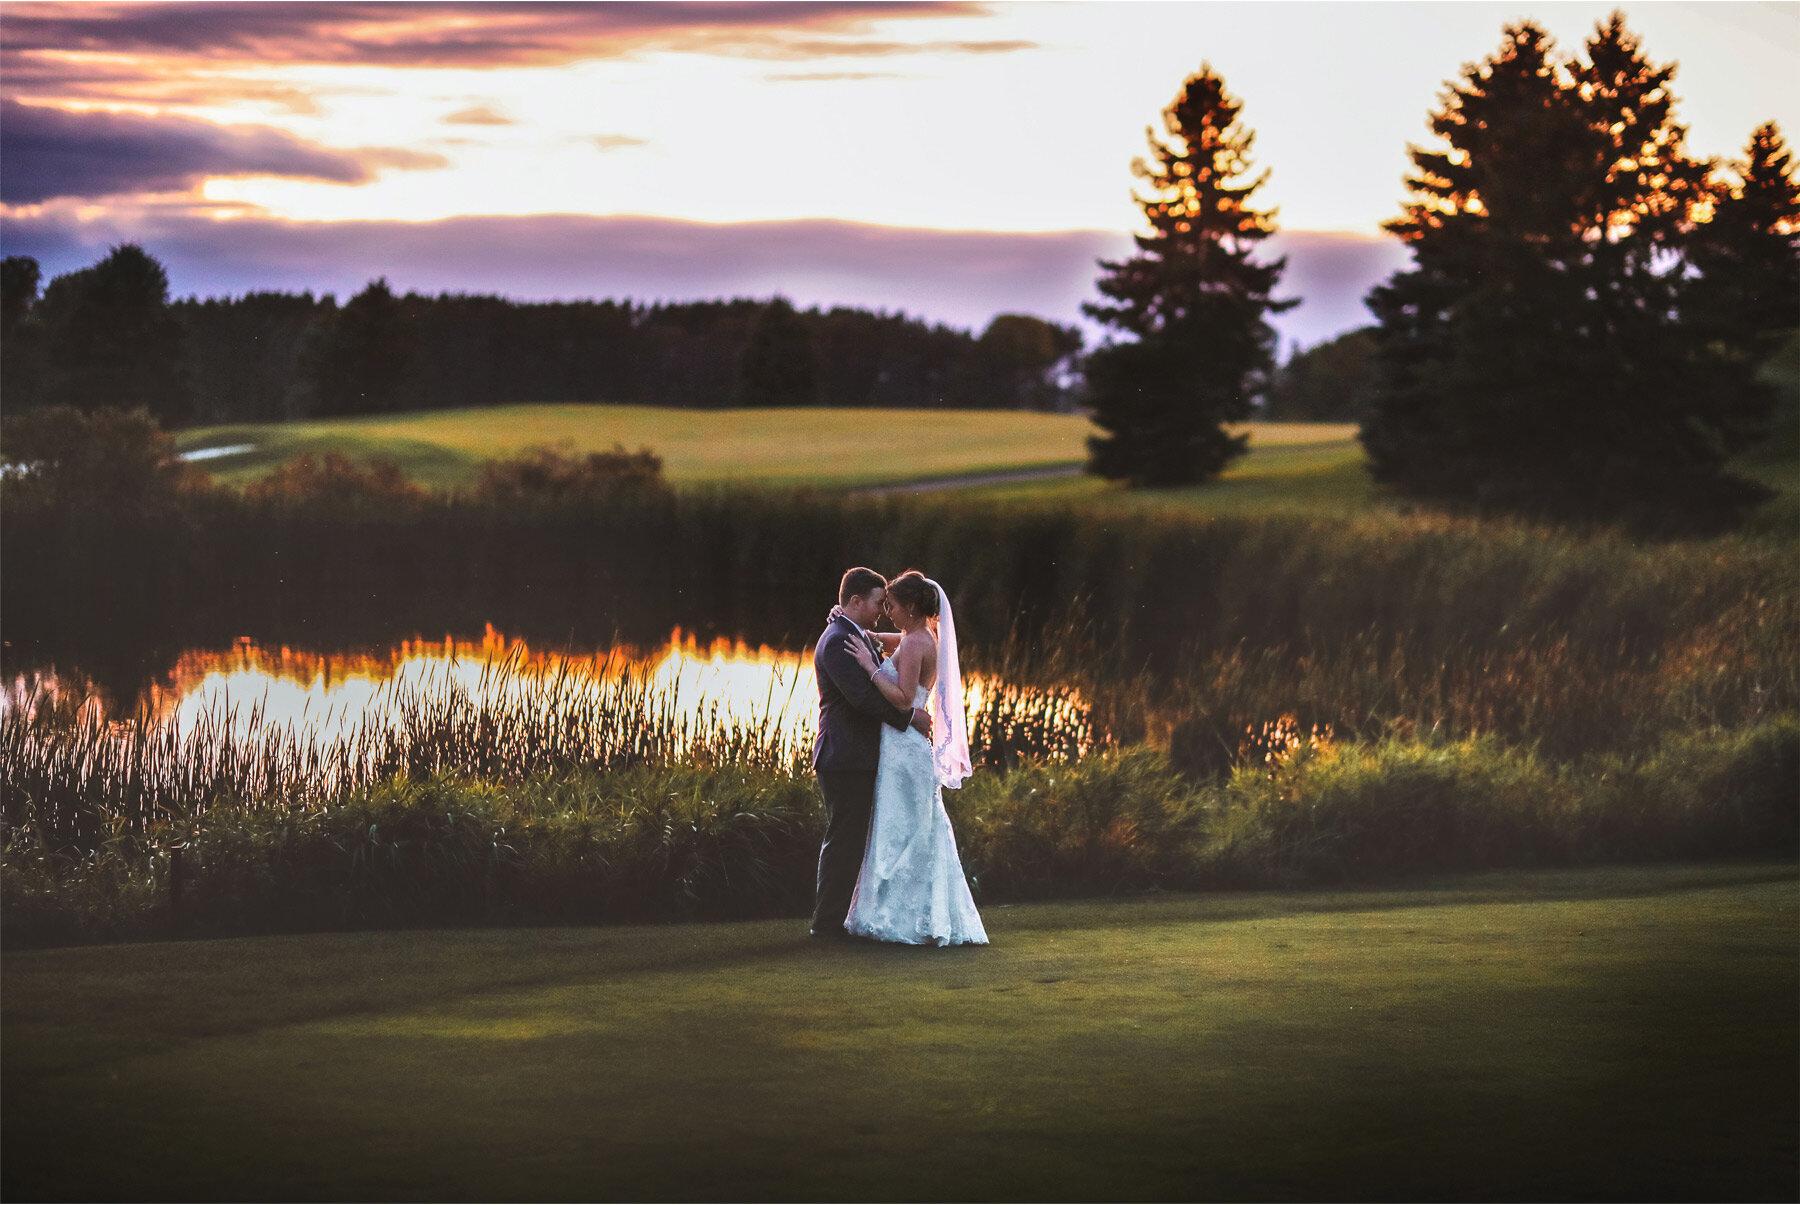 20-Vick-Photography-Minneapolis-Minnesota-Wedding-Rush-Creek-Golf-Club-Reception-Sunset-Amanda-and-Michael.jpg